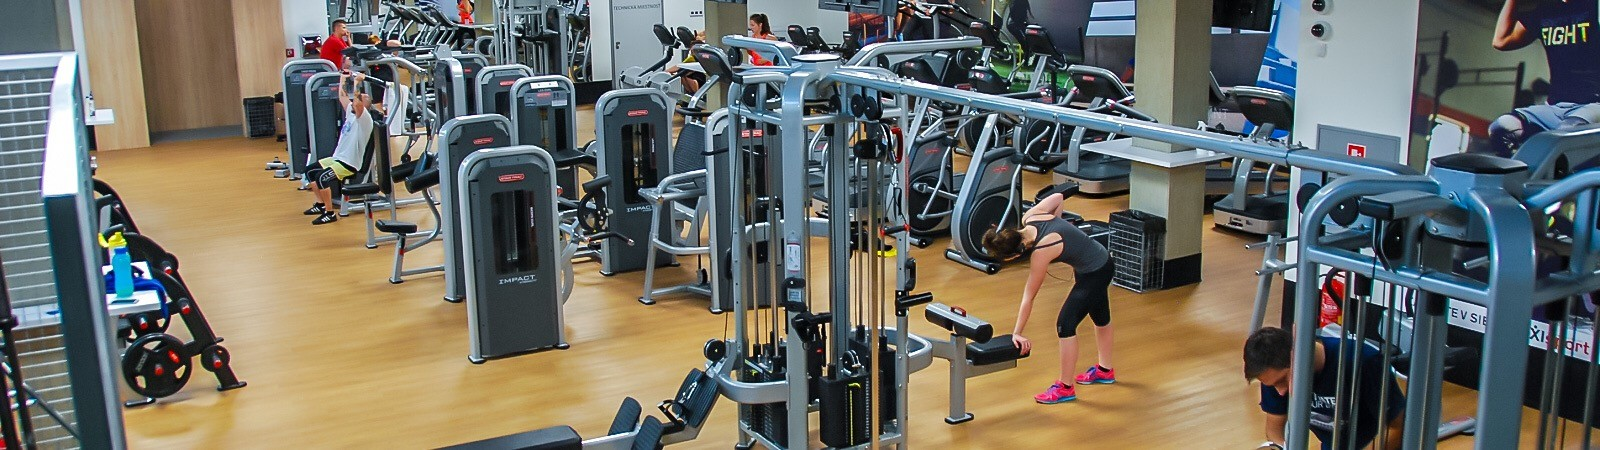 Fitness Centrum | Posilňovňa | Fitko | Poprad | Golem - Forum